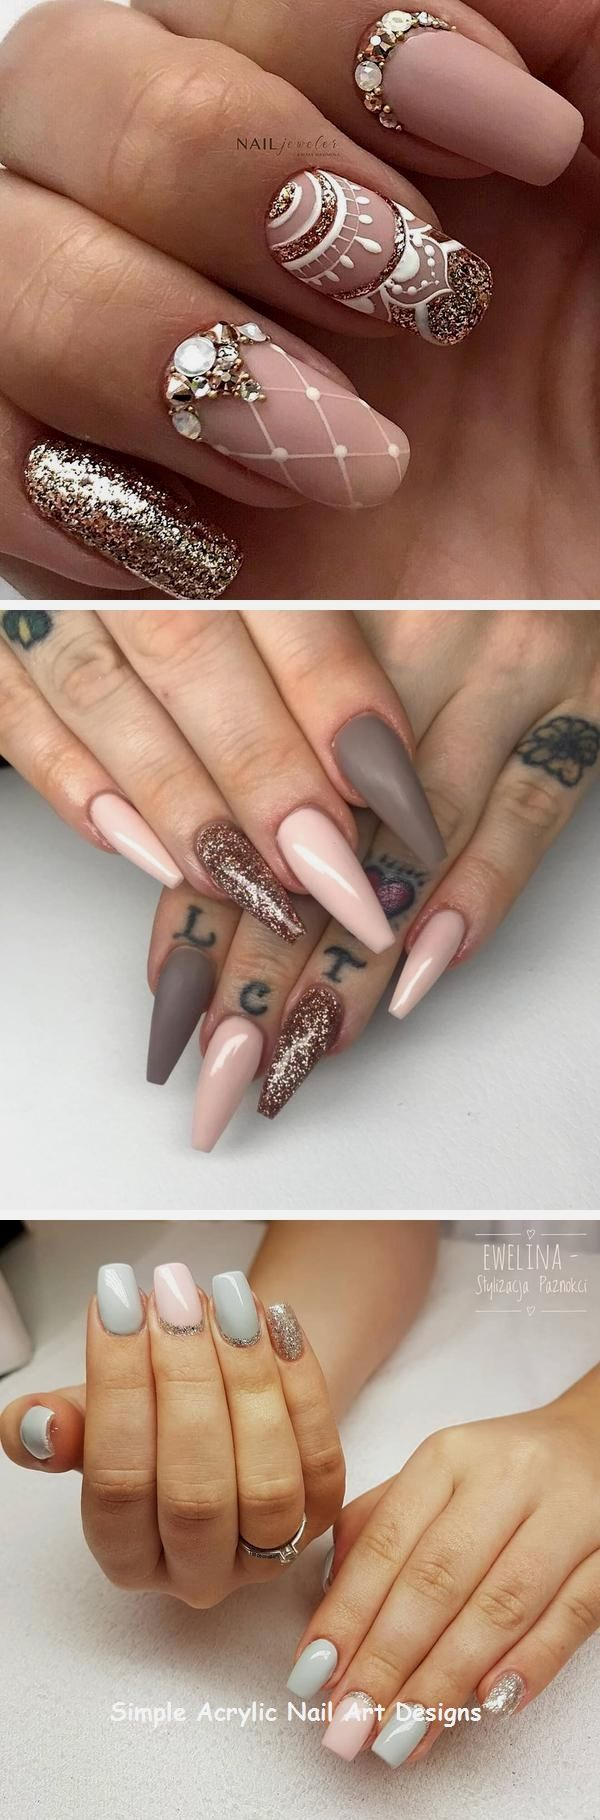 20 Great Ideas How To Make Acrylic Nails By Yourself Nails Acrylicnail Nail Art Hacks Acrylic Nail Art Acrylic Nails